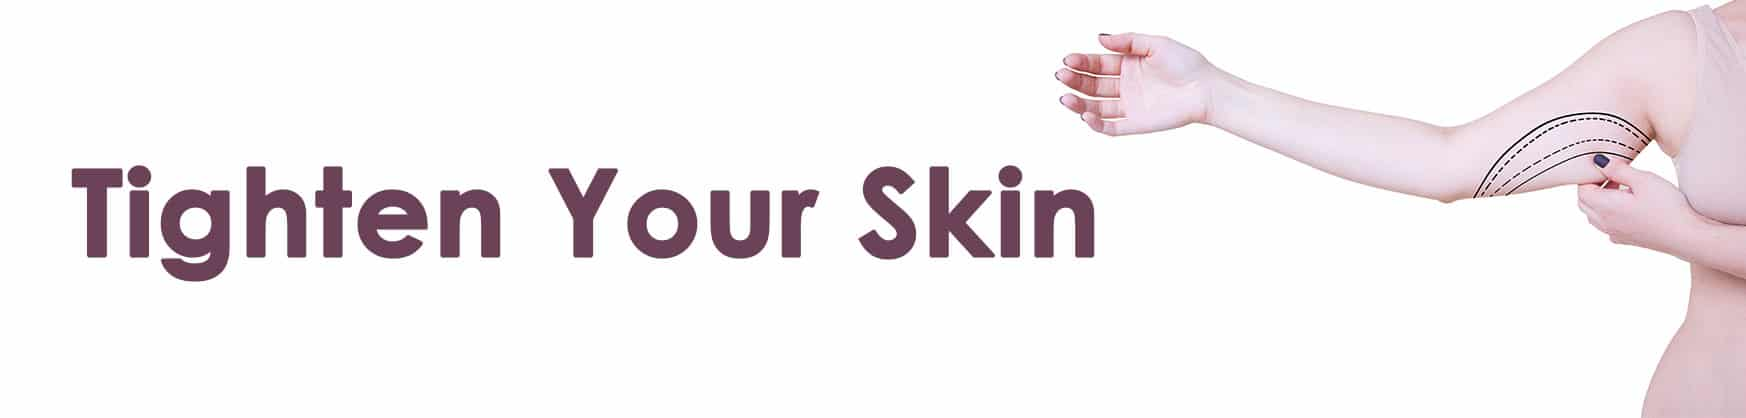 skin tightening treatments in Hartford